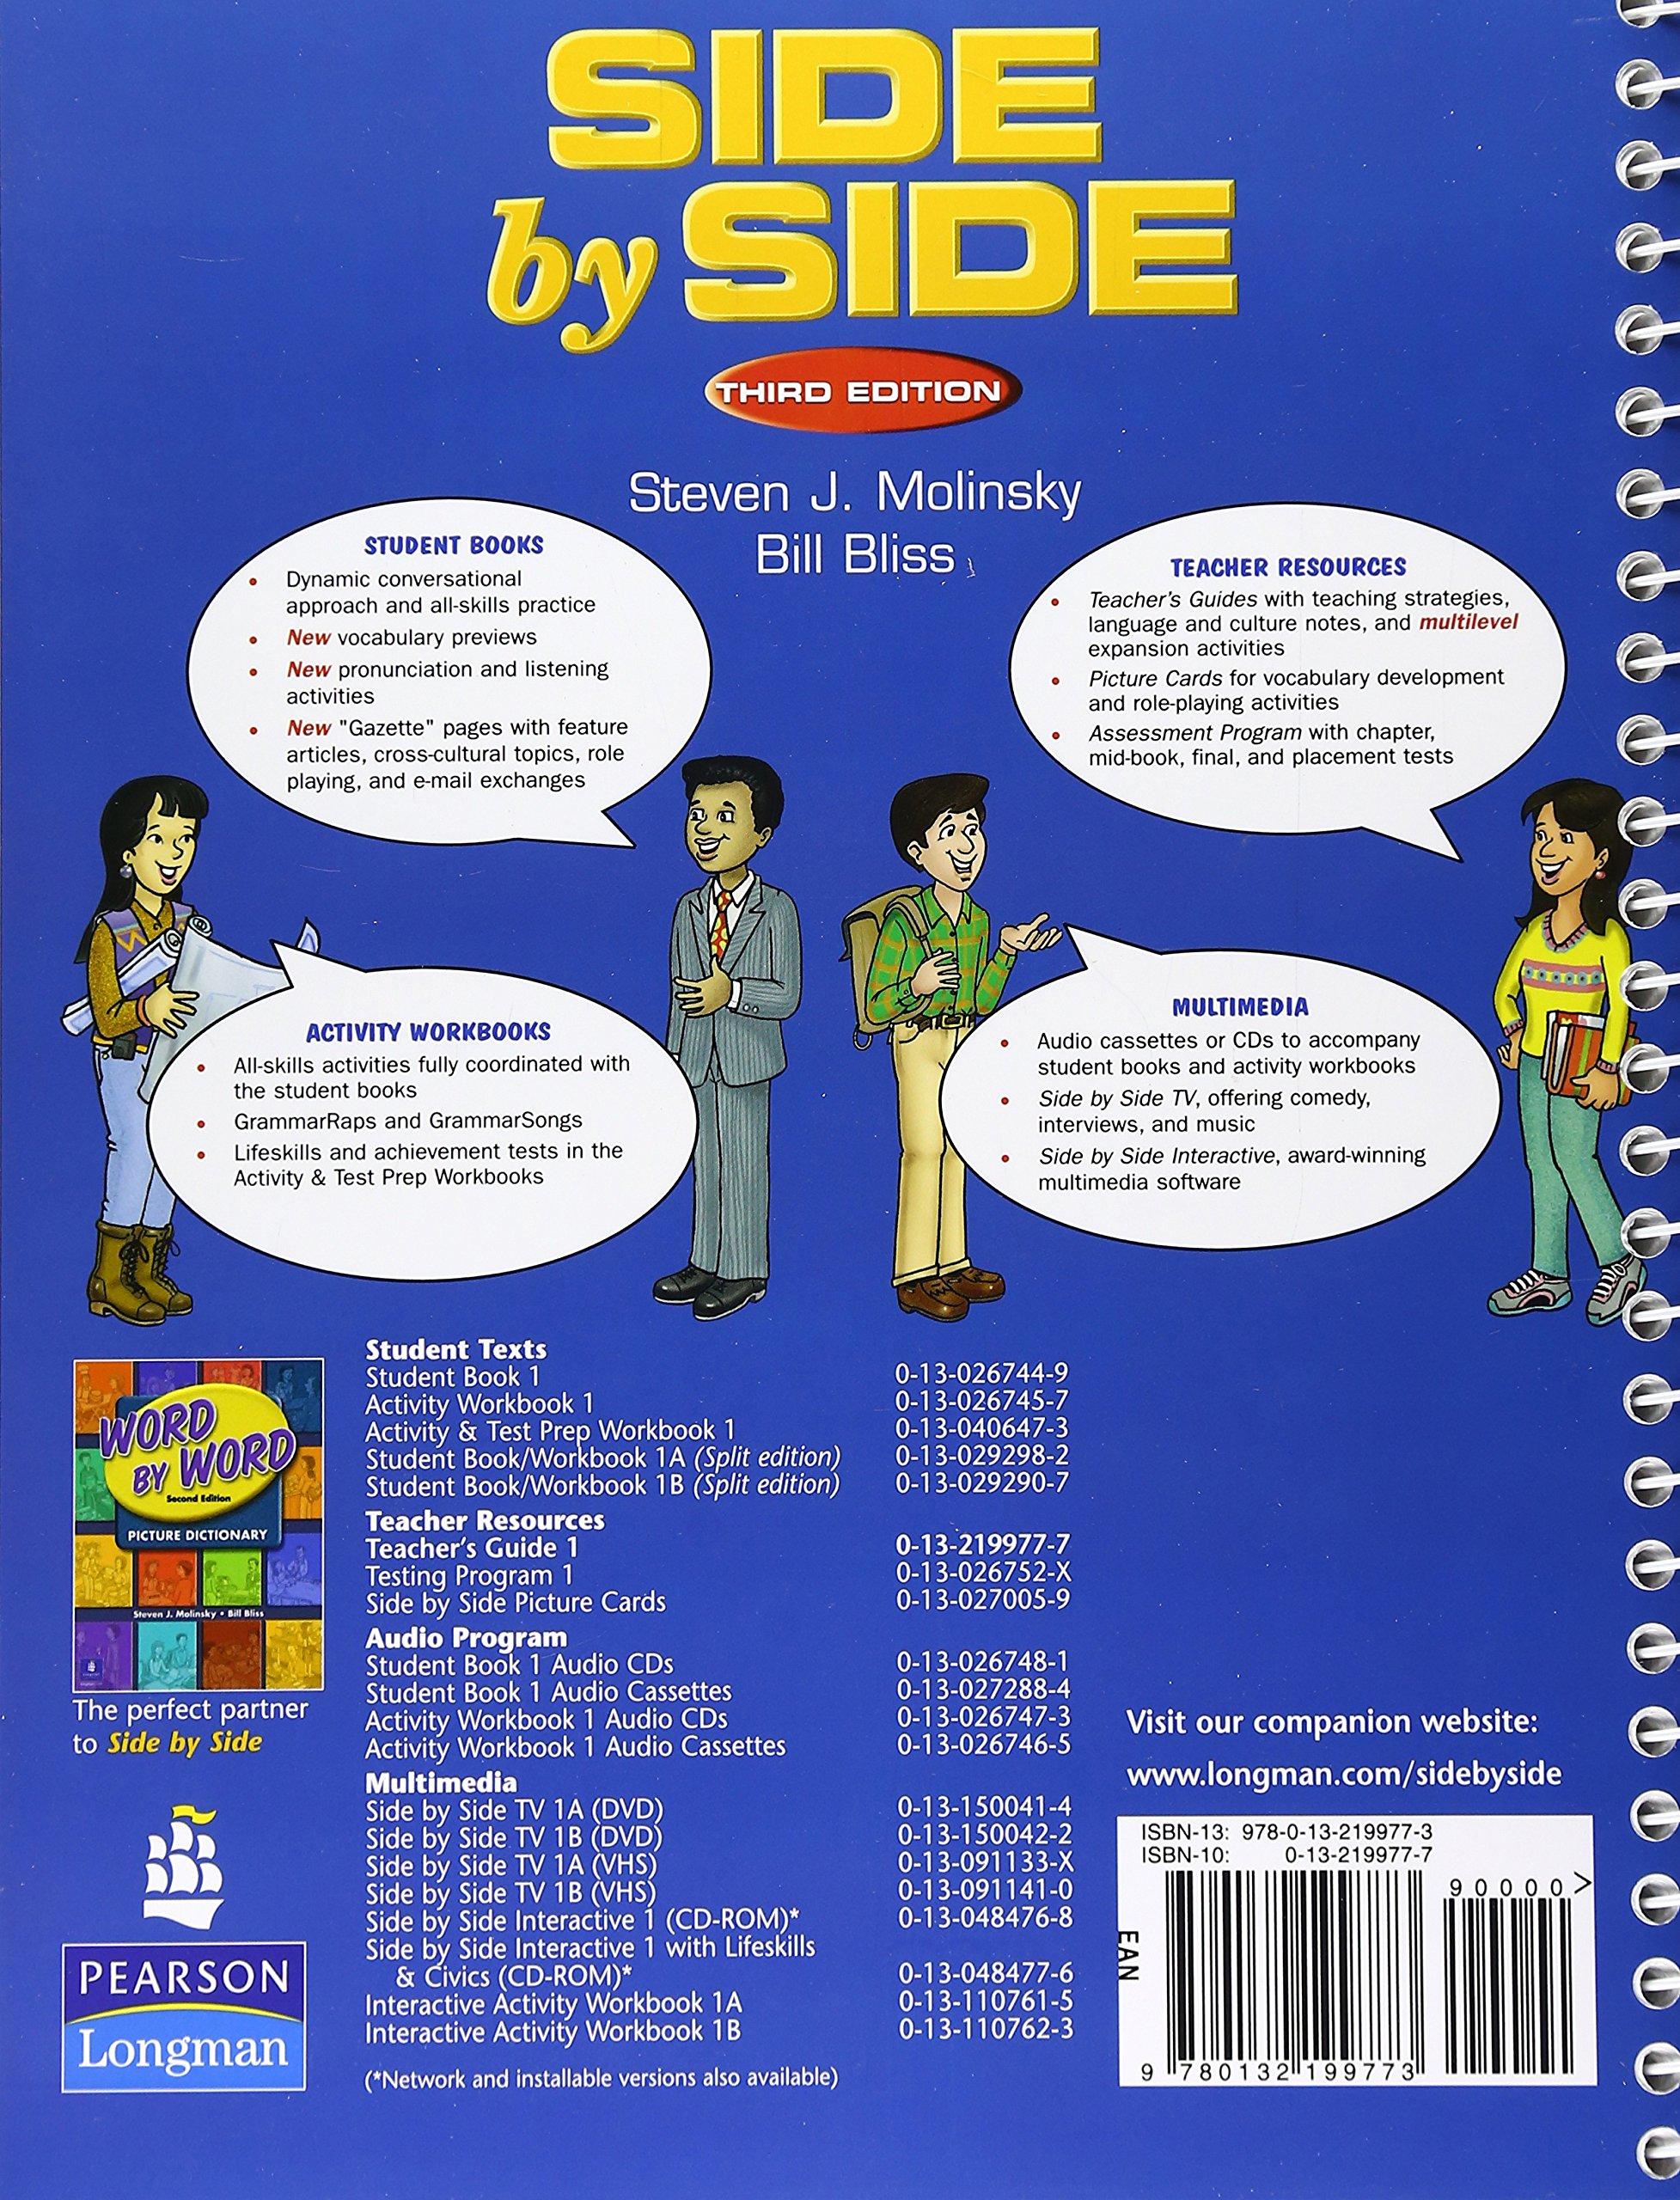 Side by Side: Teacher's Guide, 3rd Edition: Steven J. Molinsky, Bill Bliss:  9780132199773: Amazon.com: Books